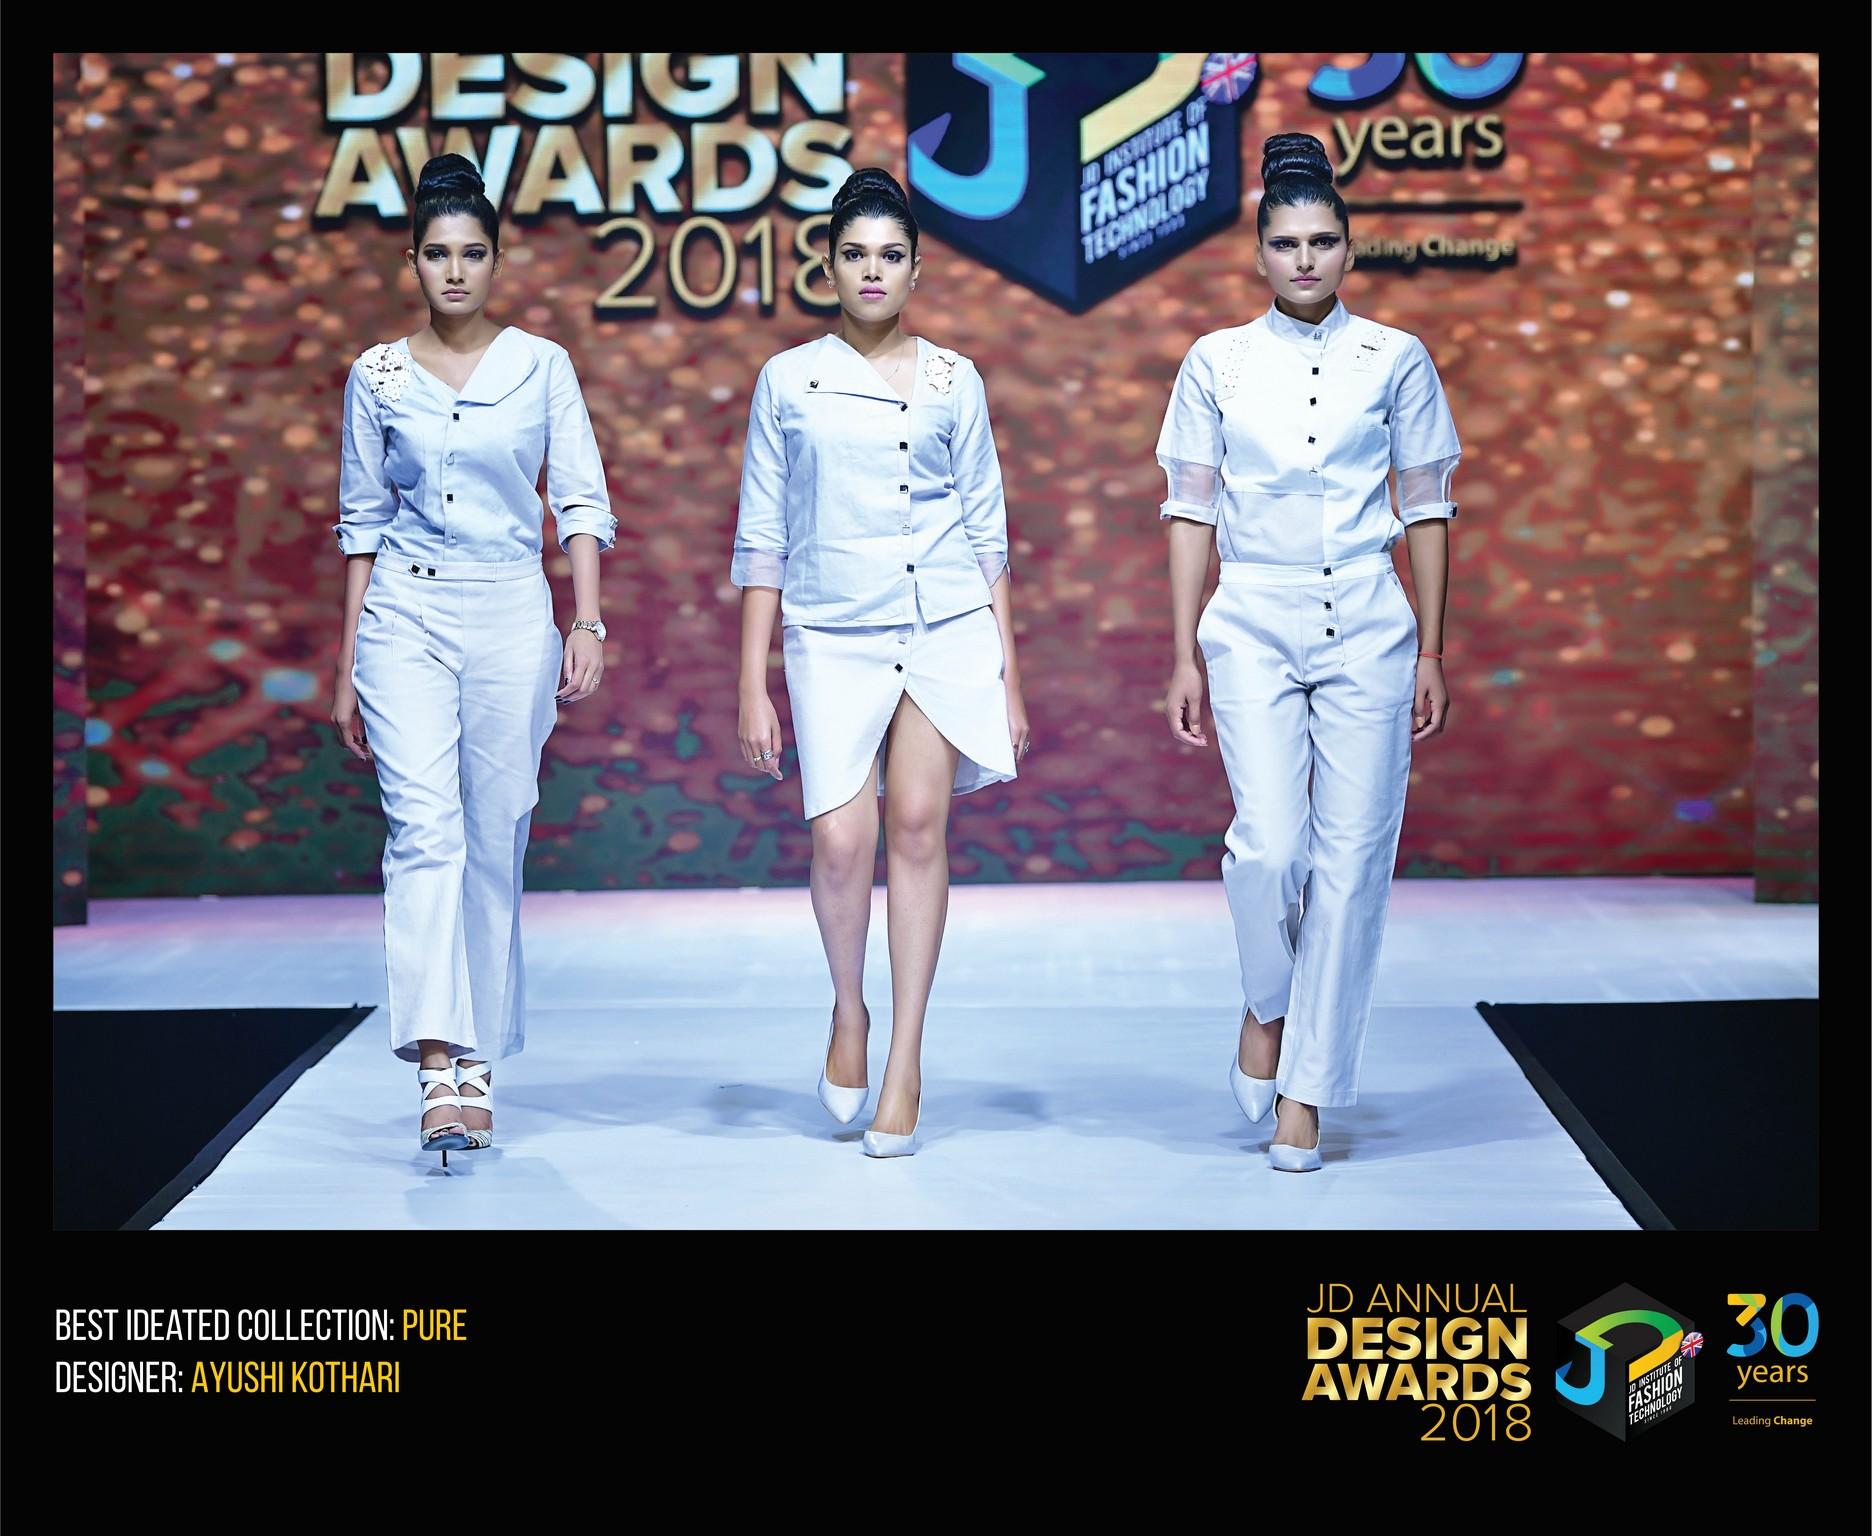 Pure – Change – JD Annual Design Awards 2018 | Designer: Ayushi Kothari (ADFD 2015 Batch) | Photography : Jerin Nath (@jerin_nath) pure - Pure12 - Pure – Change – JD Annual Design Awards 2018